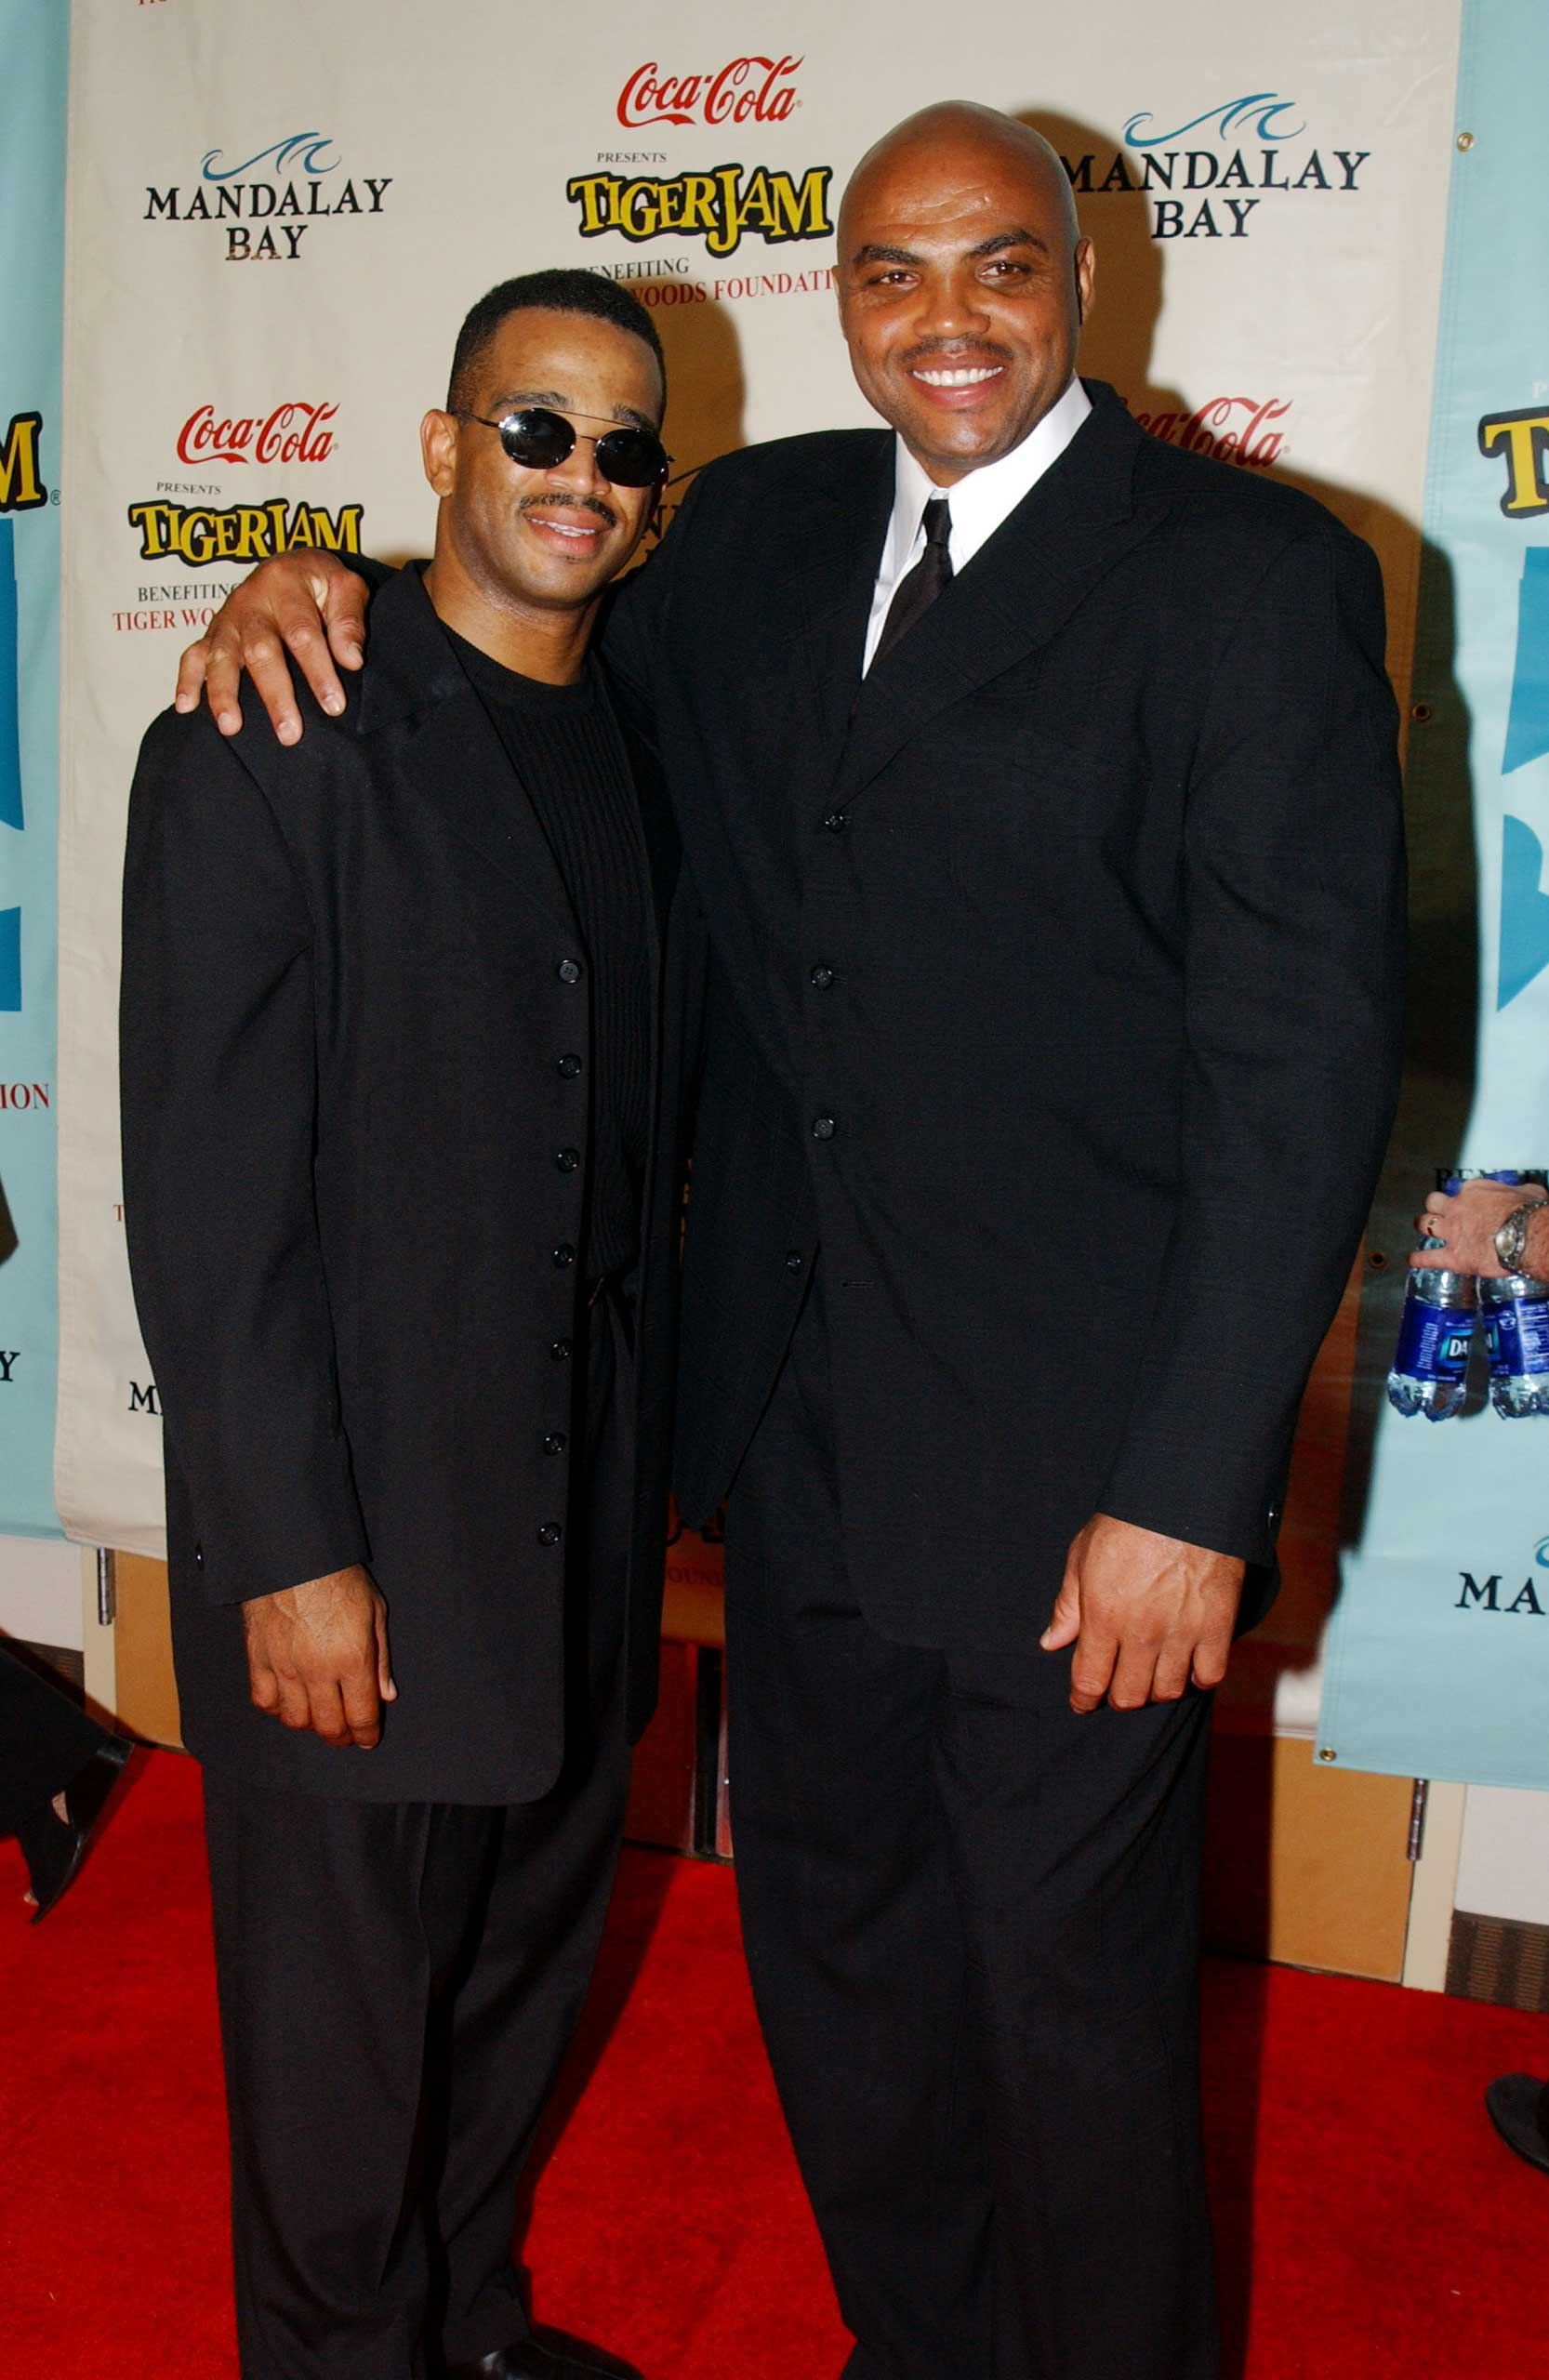 Stuart Scott and Charles Barkley during Tiger Jam V in Las Vegas on April 21, 2002.